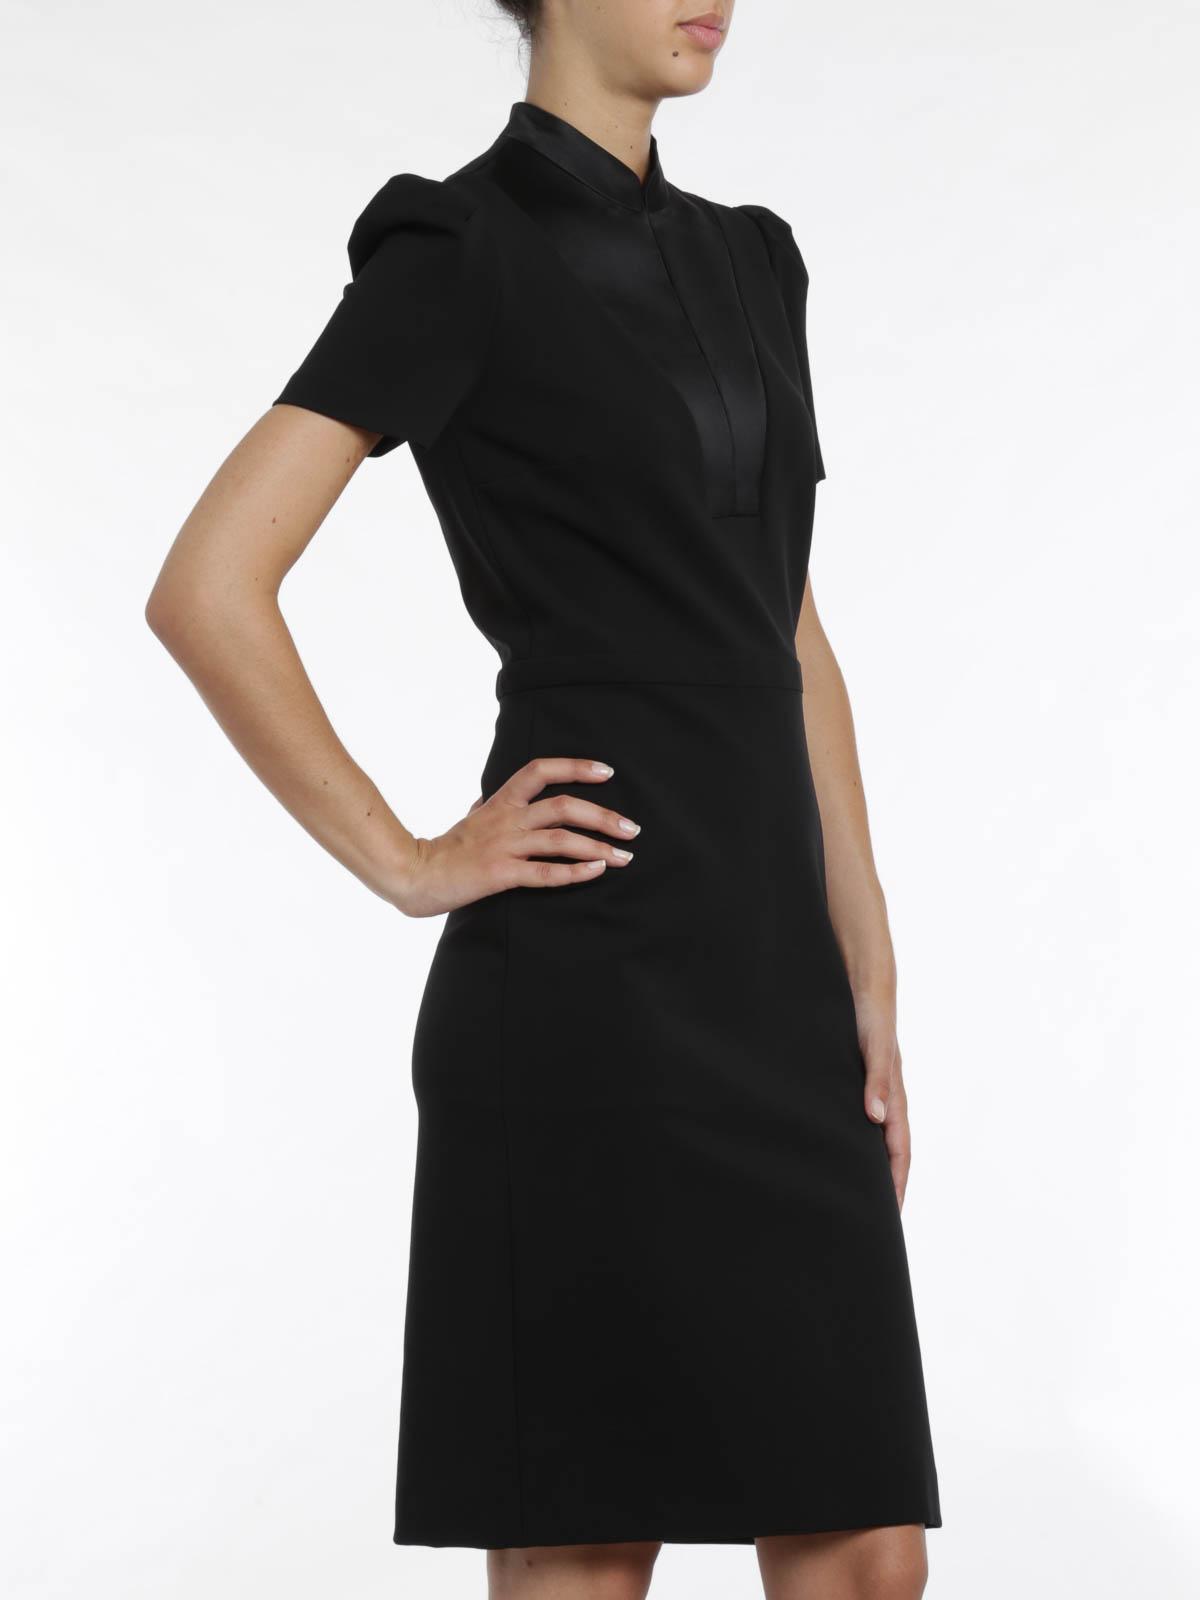 Brainy Mademoiselle: Mandarin Collar Dress   Mandarin Collar Cocktail Dress